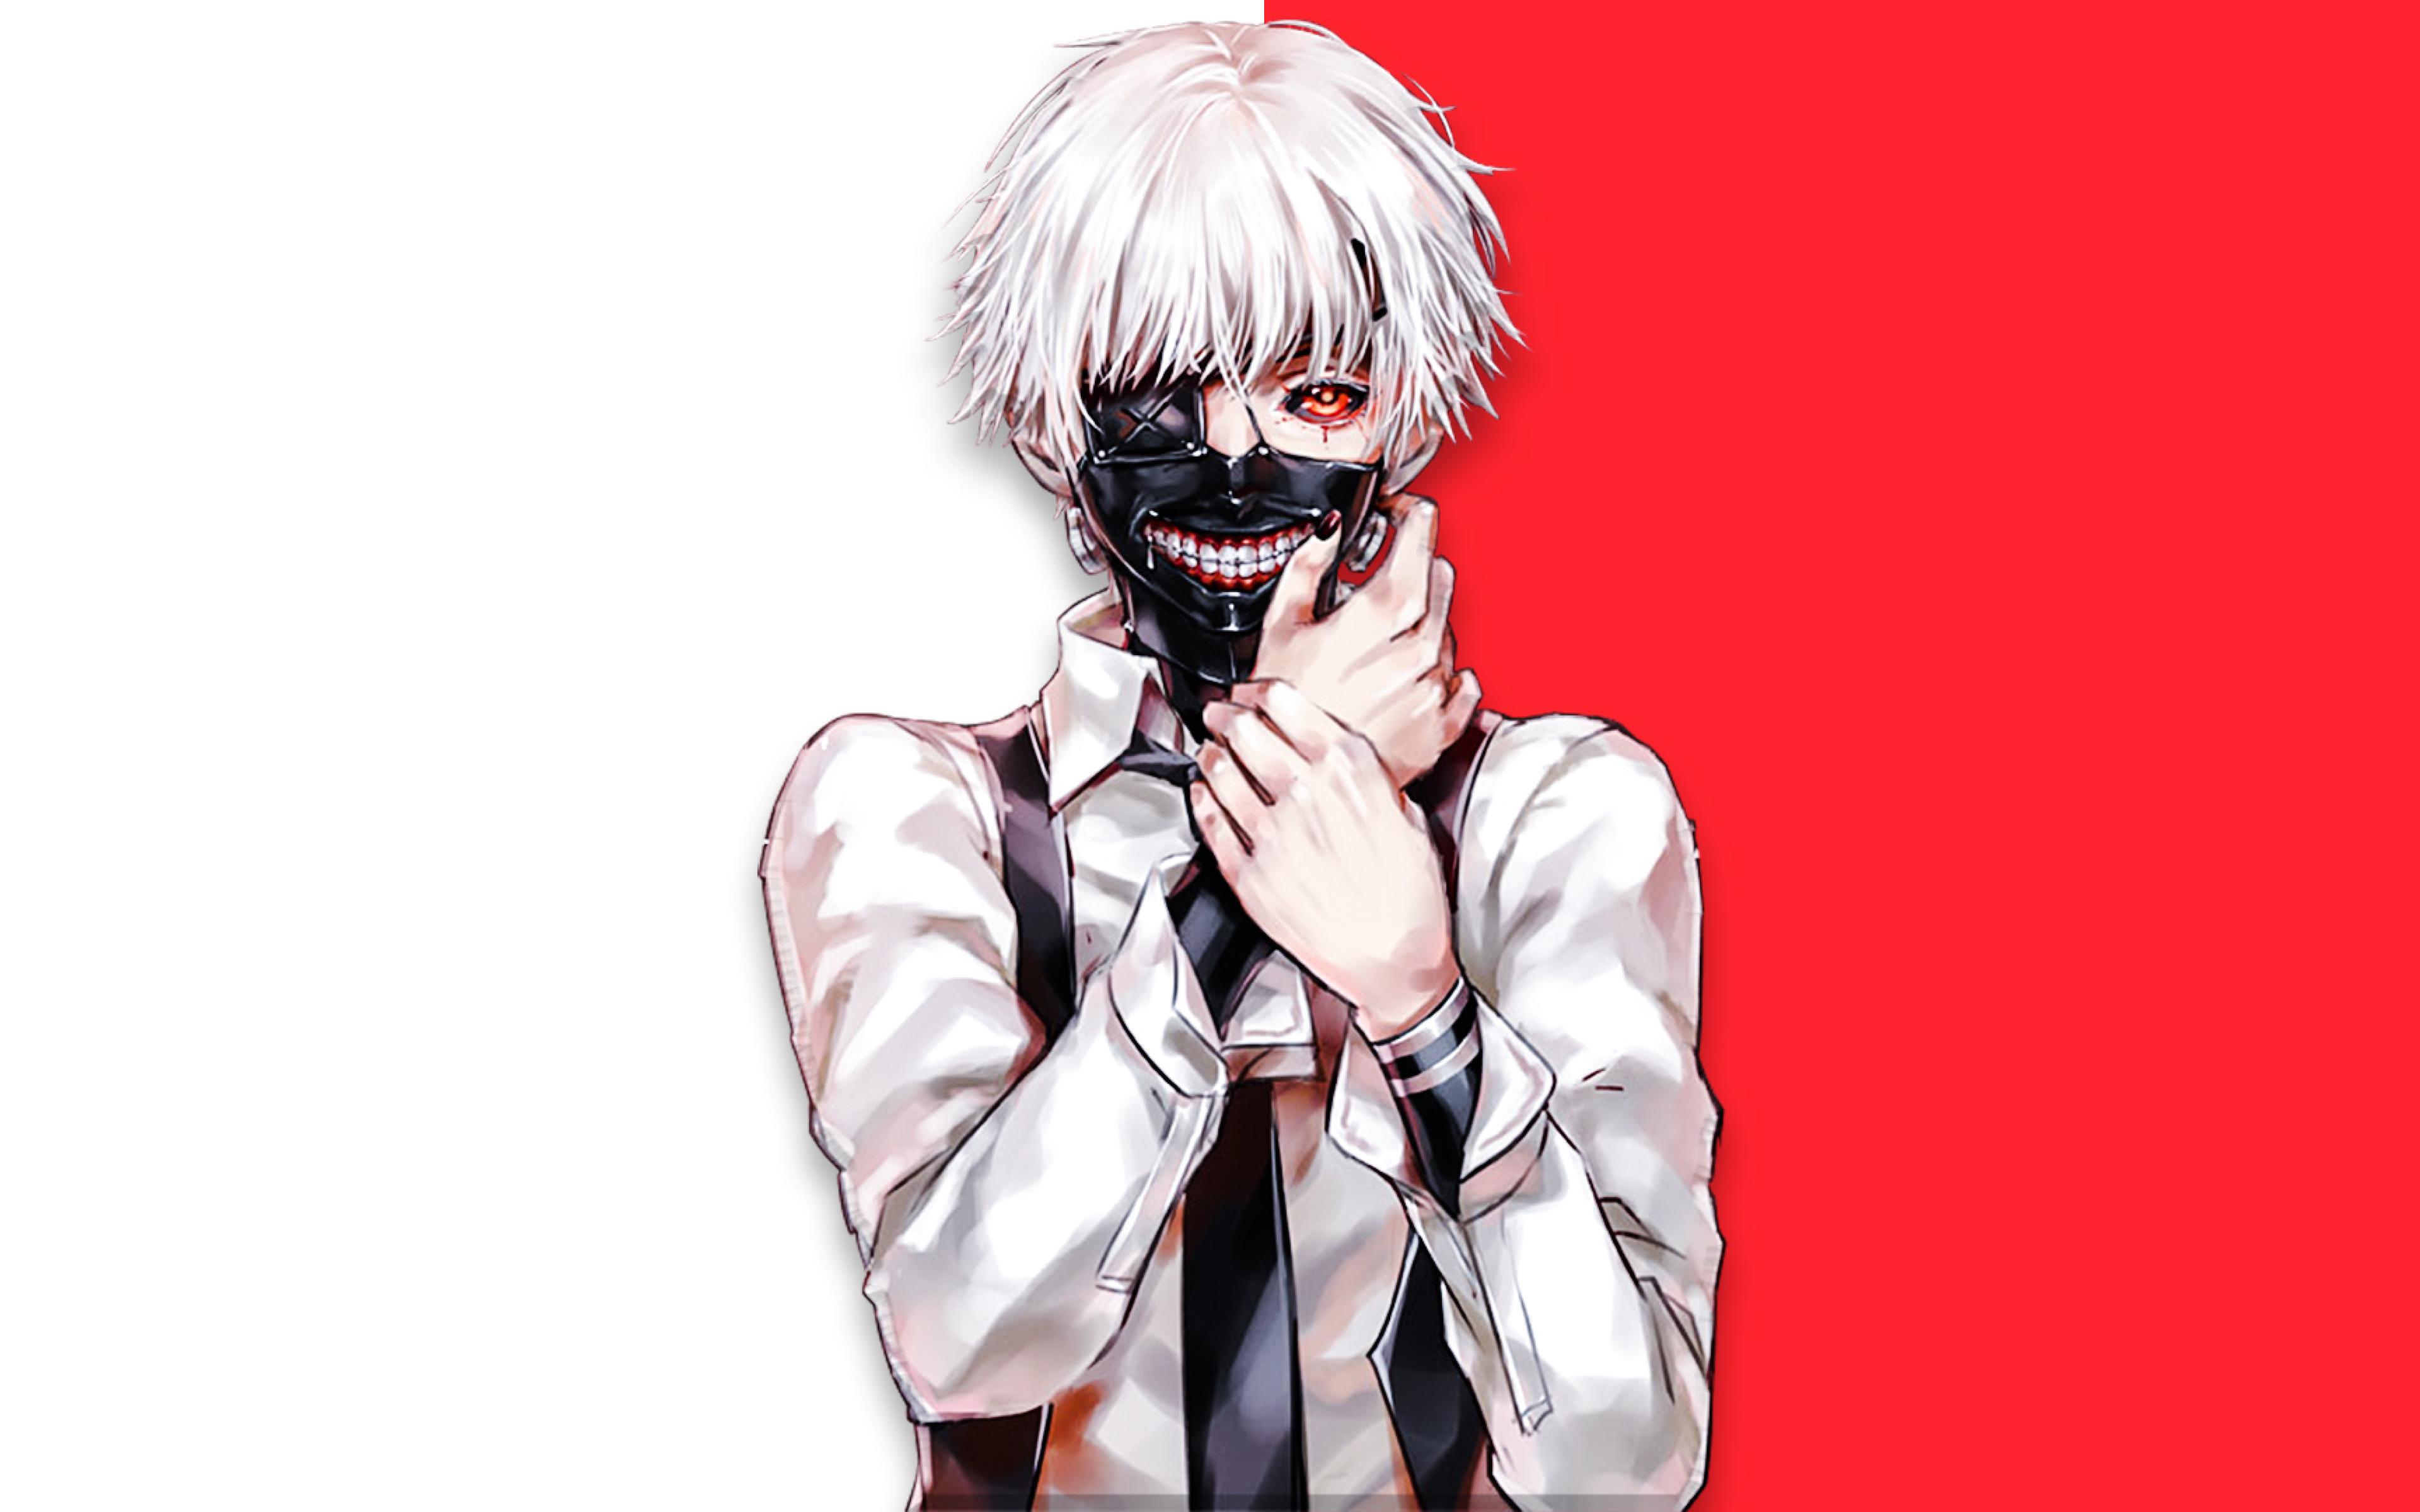 3840x2400 Ken Kaneki Tokyo Ghoul Art UHD 4K 3840x2400 ...